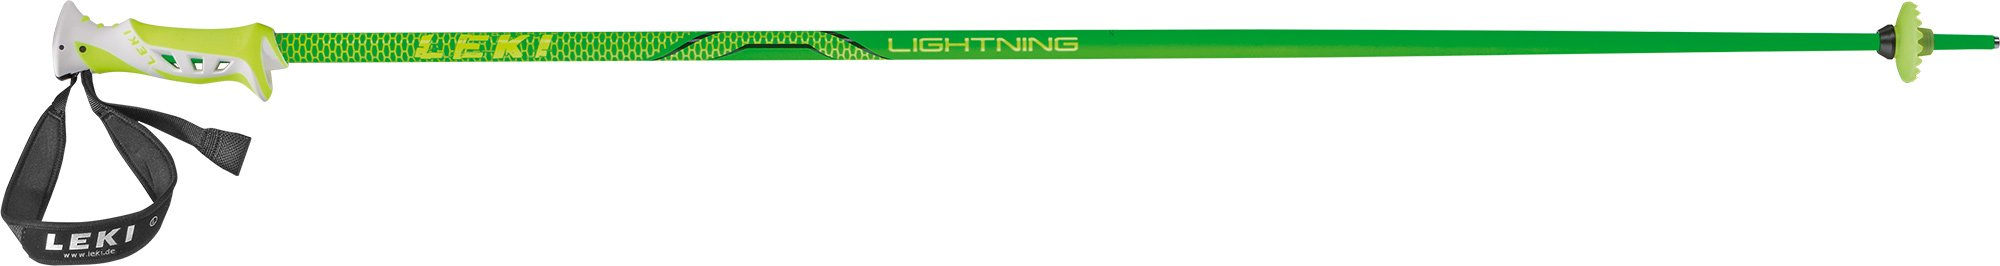 Leki Lightning 120